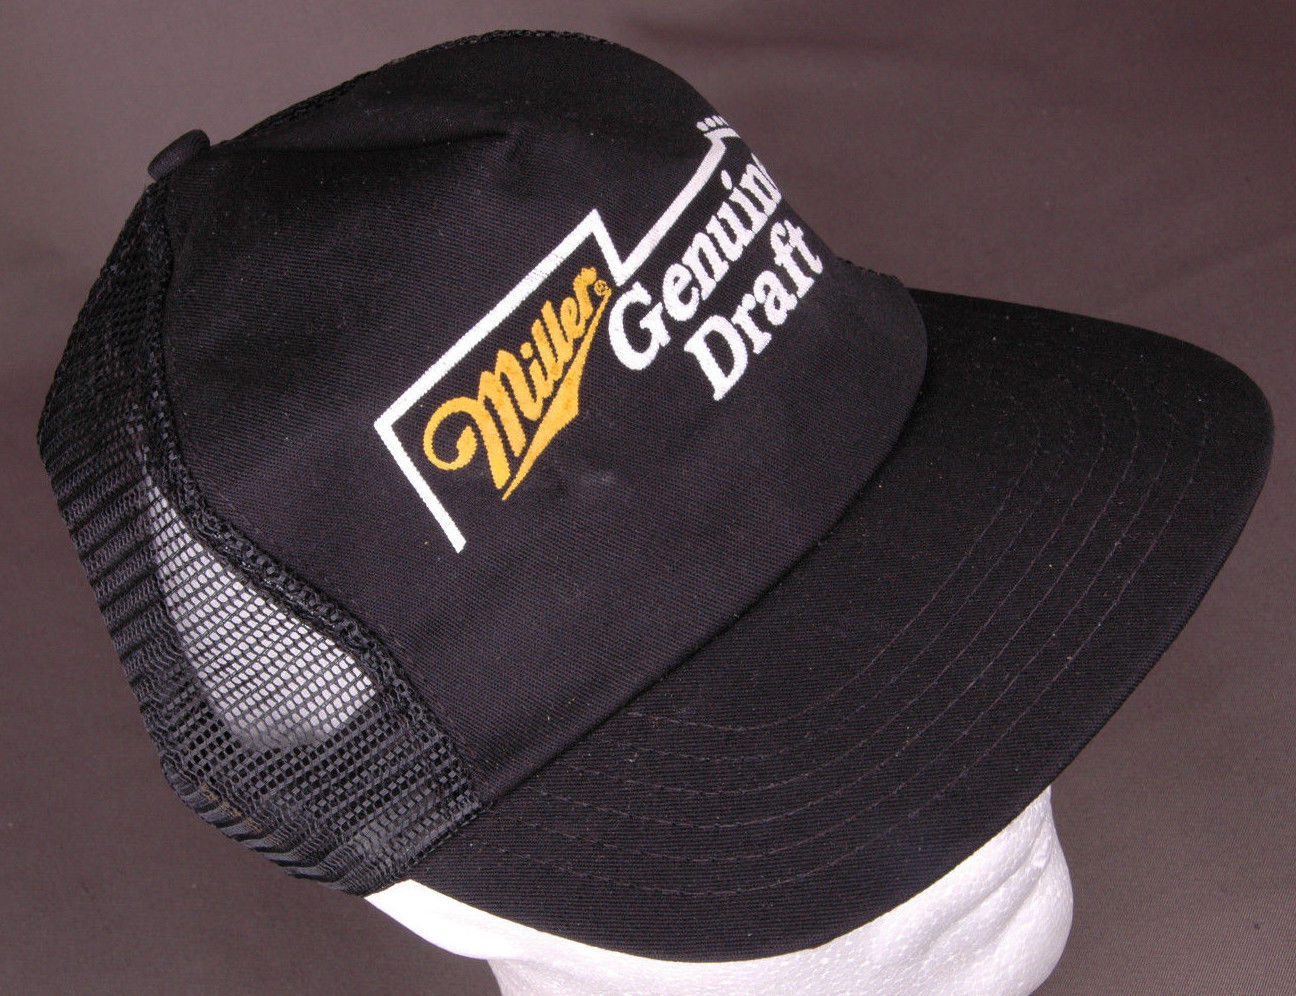 7a3d144cd1a Vtg Miller Genuine Draft Trucker Hat-Guitar-Snapback-Mesh-Black-Beer